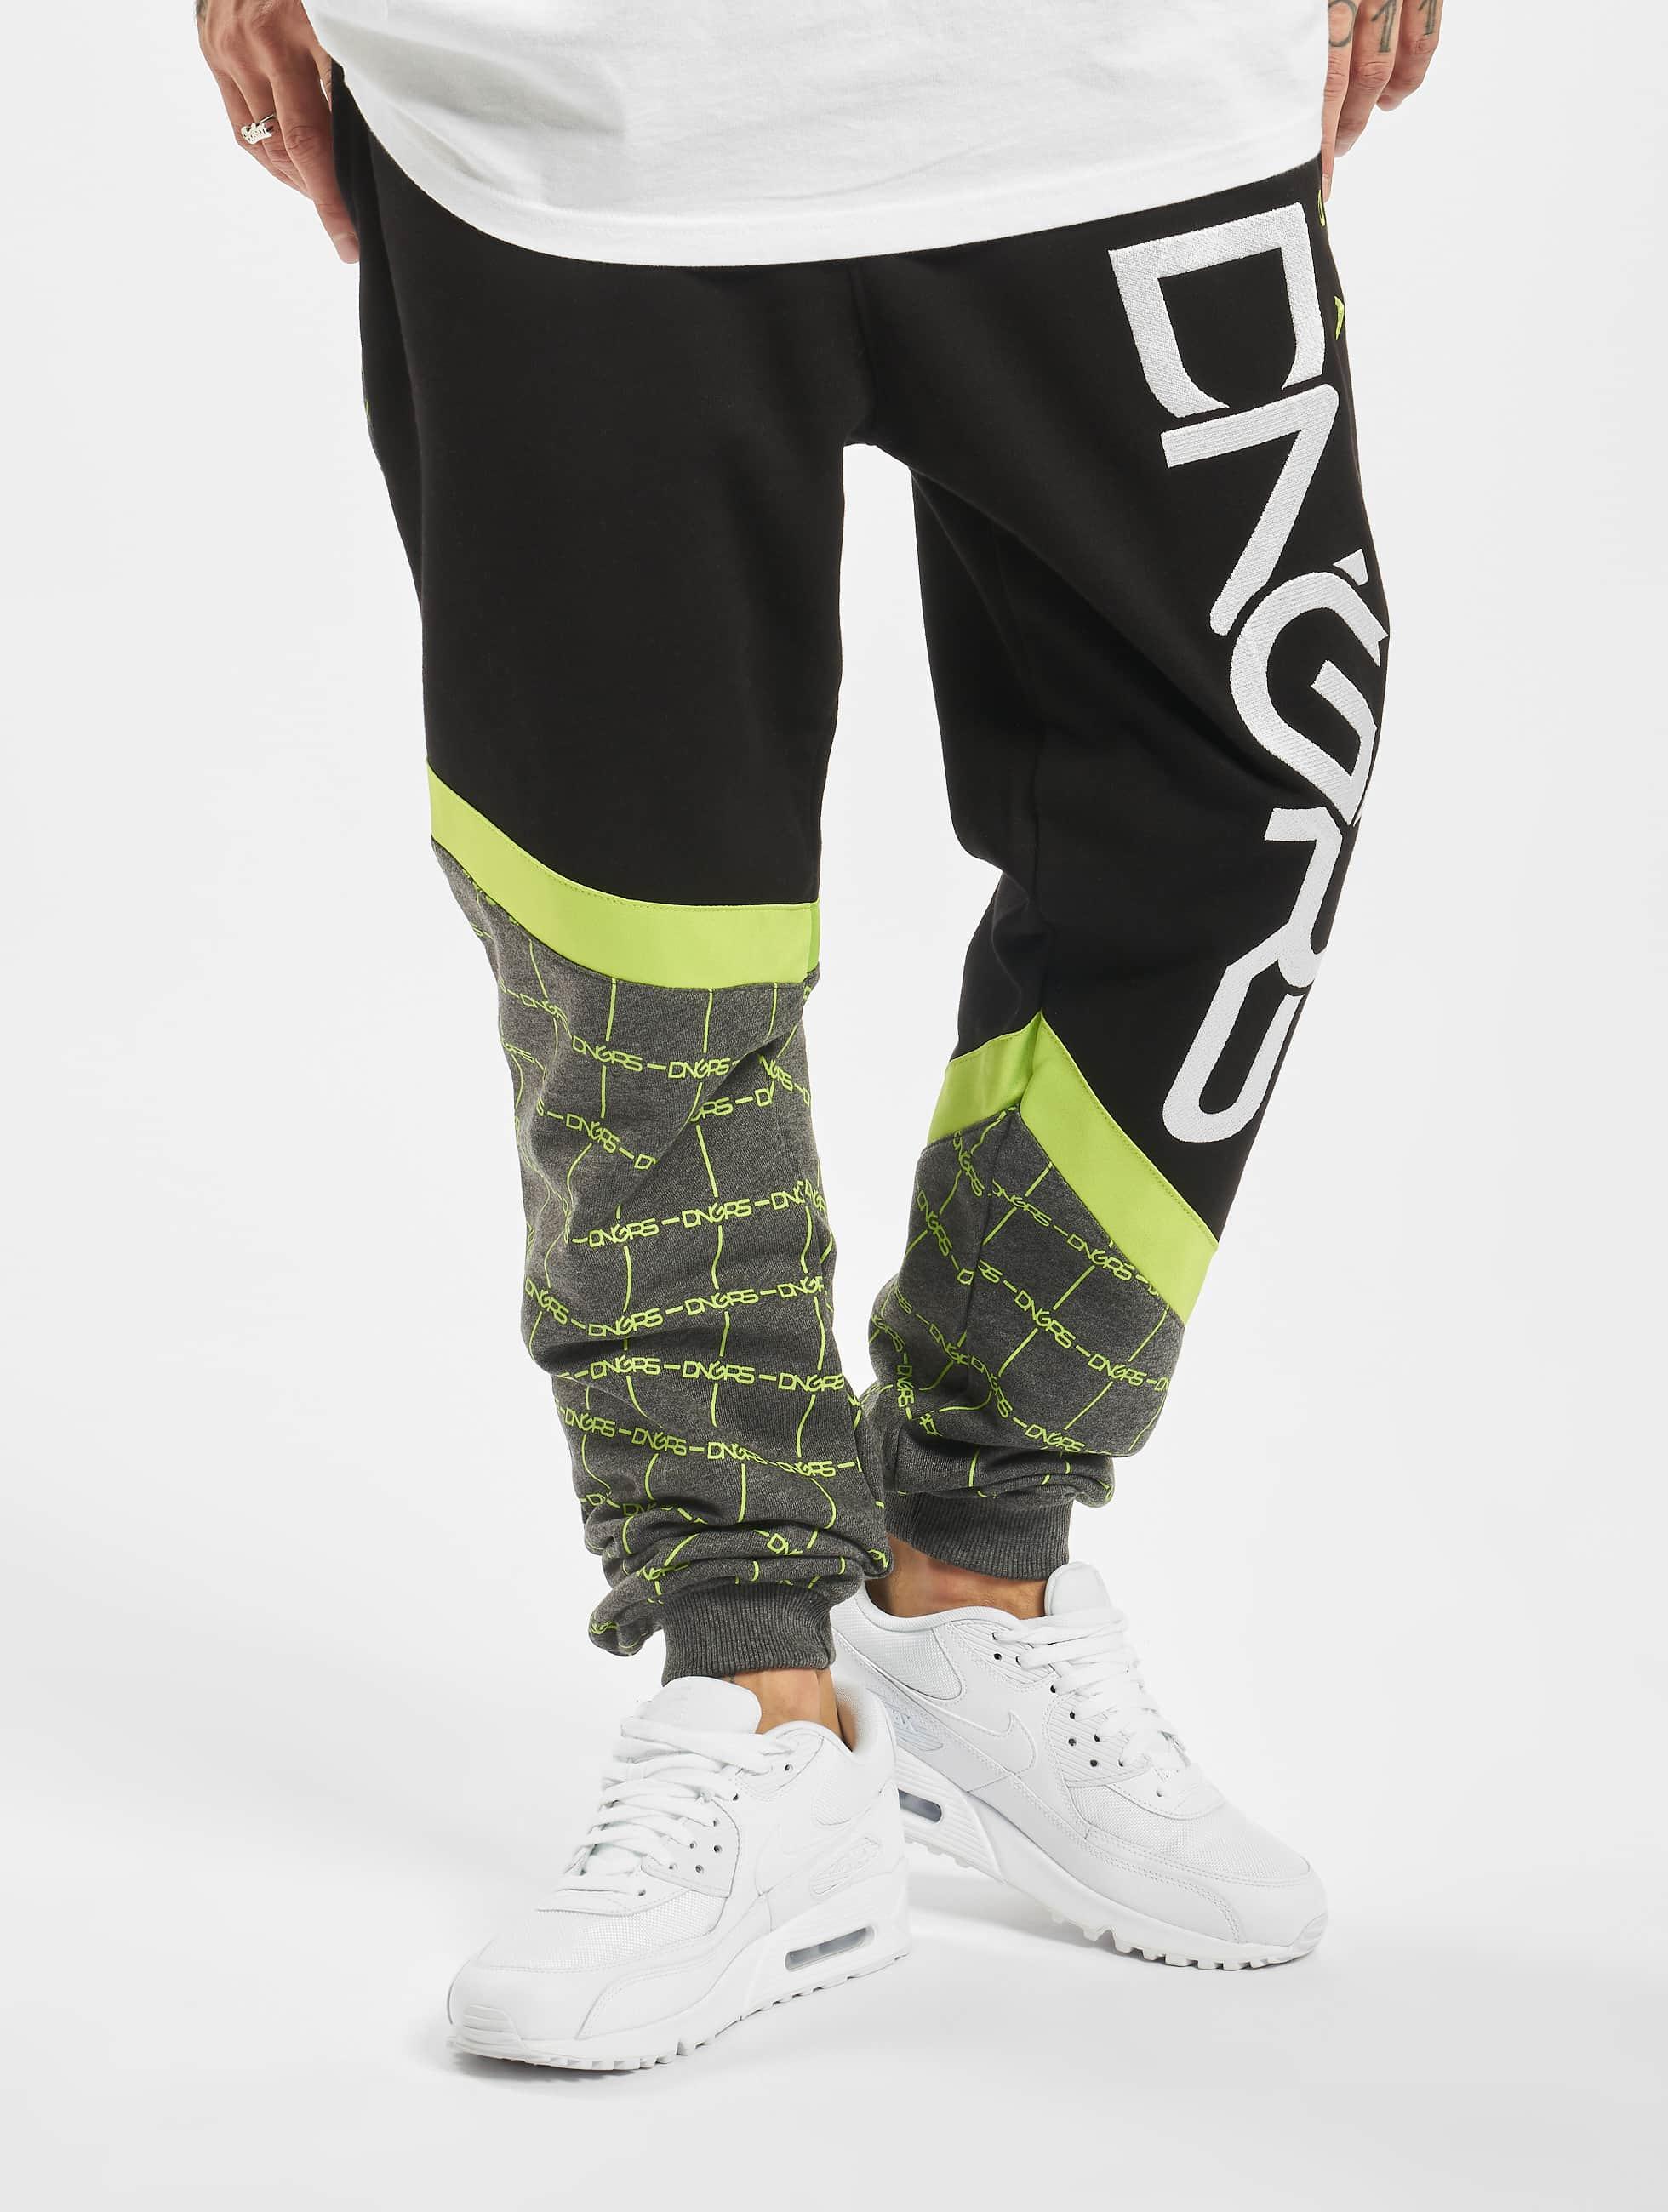 def shop.nlpelle pelle baxter loose fit jeans